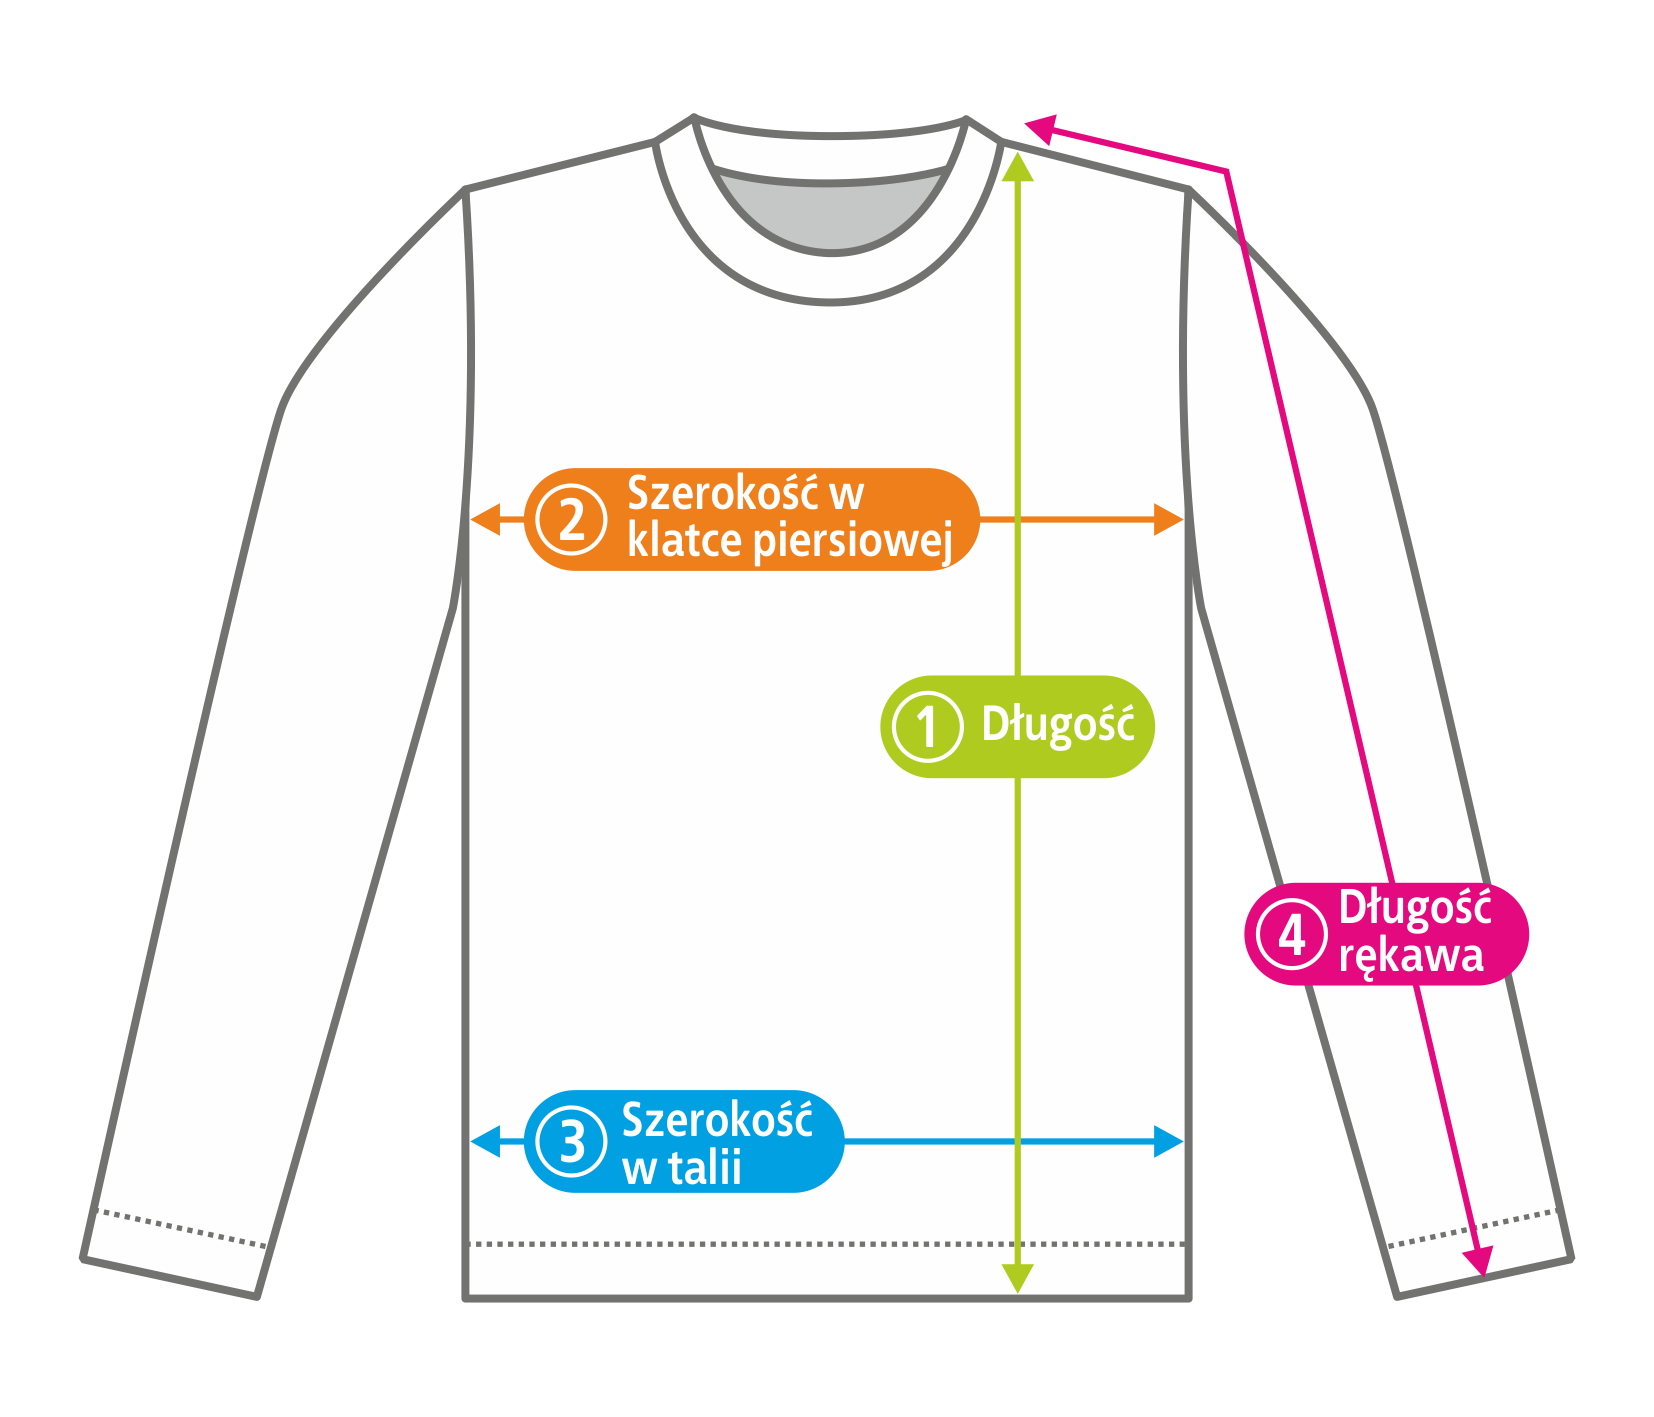 Koszulka-wymiary.png